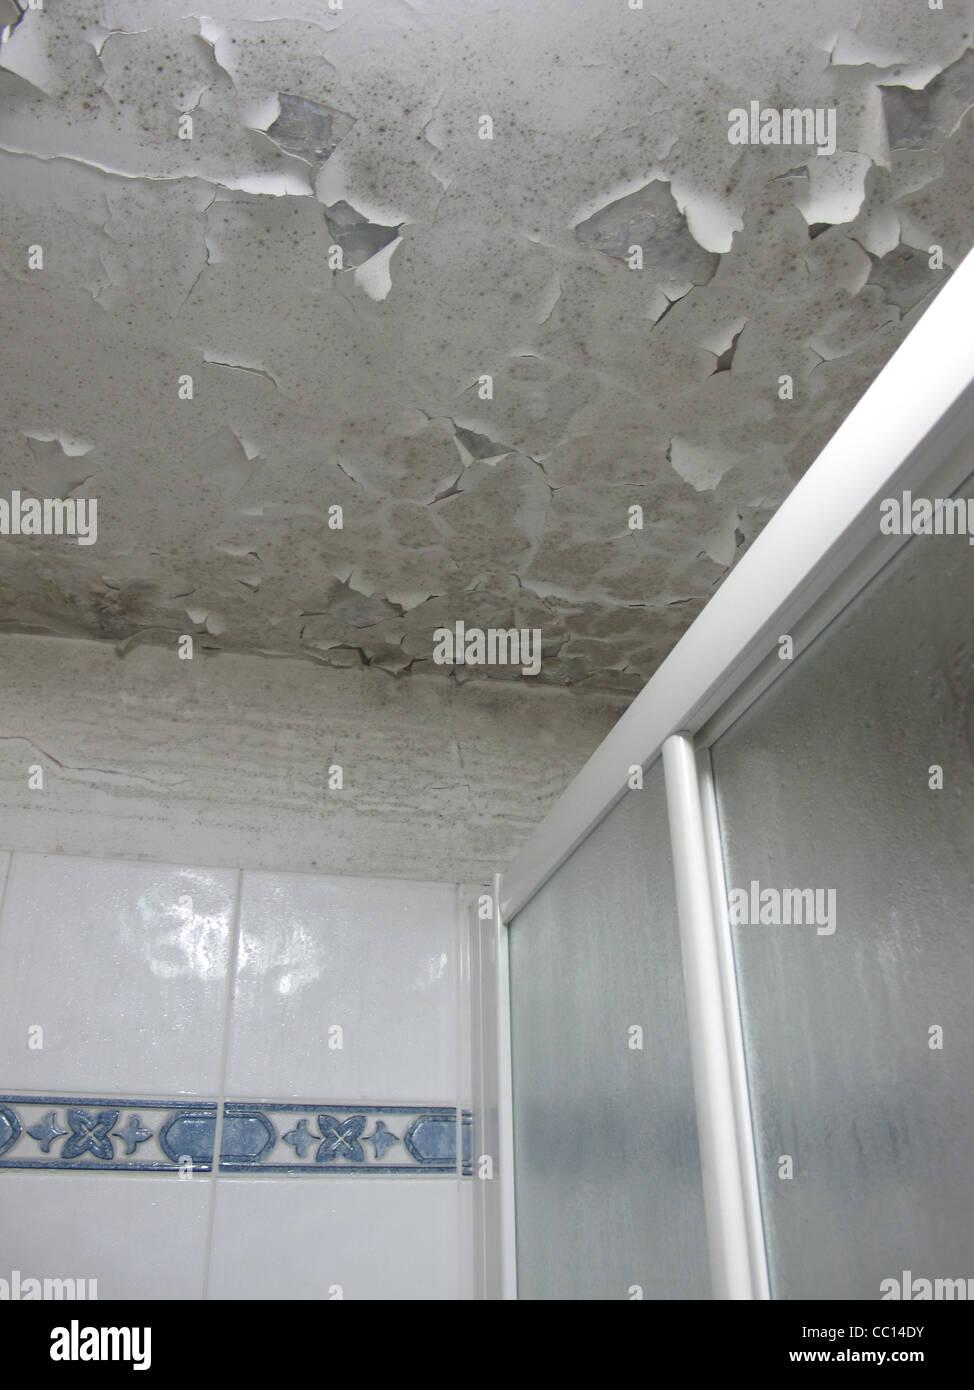 Condensation Bathroom Tiles Stock Photos Amp Condensation